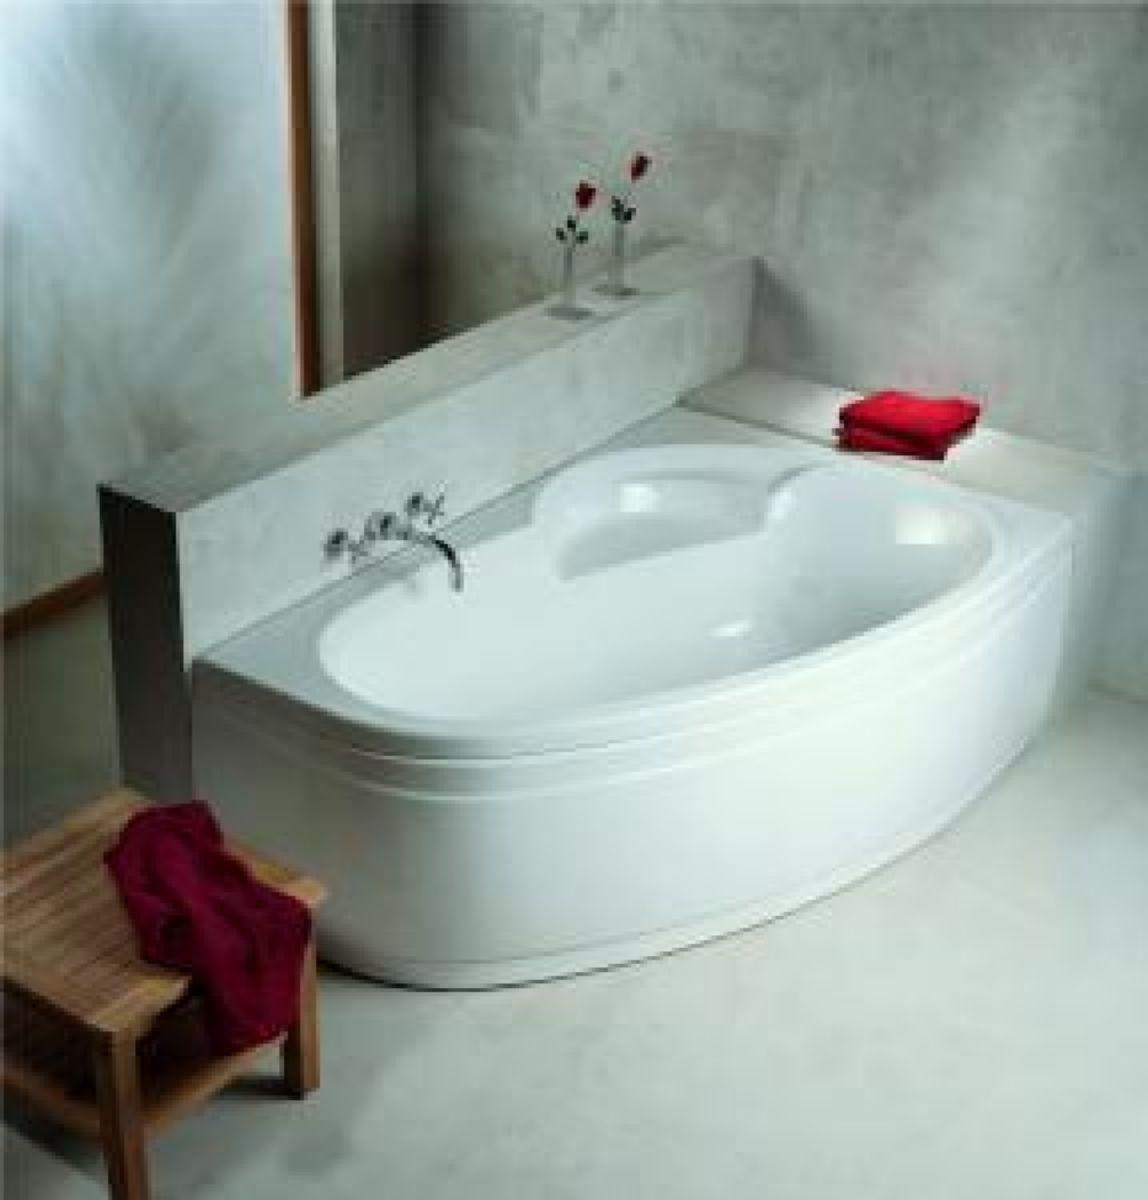 couleurs de la cuisine moderne. Black Bedroom Furniture Sets. Home Design Ideas